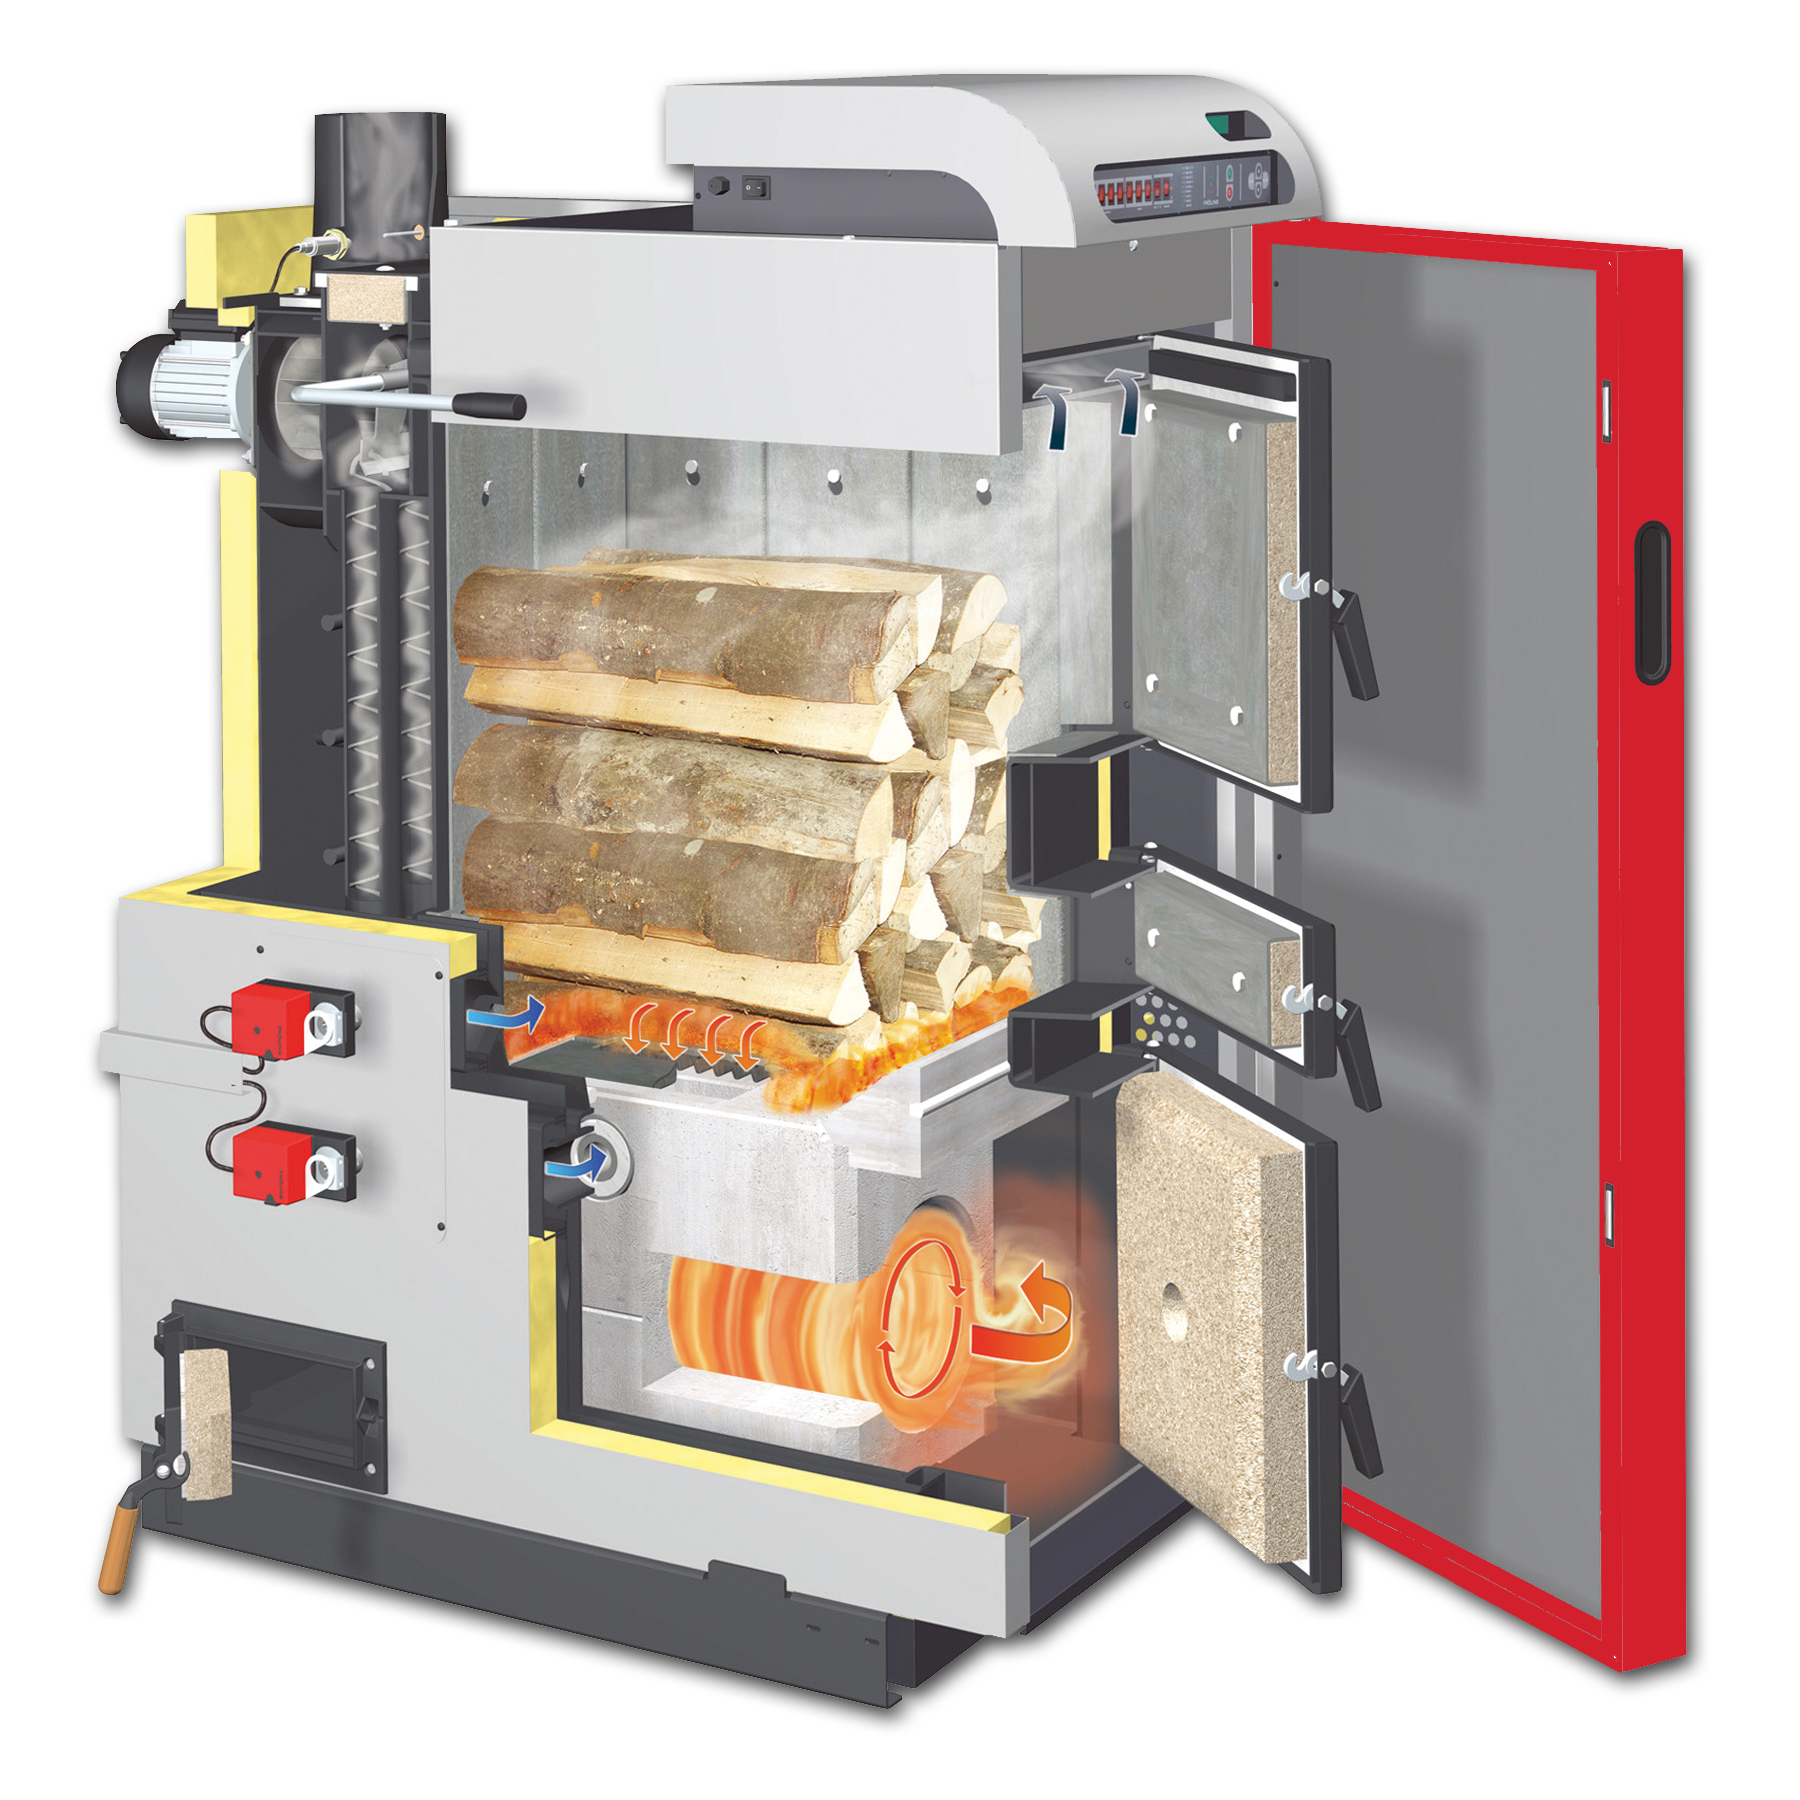 hight resolution of wood boiler installation diagram